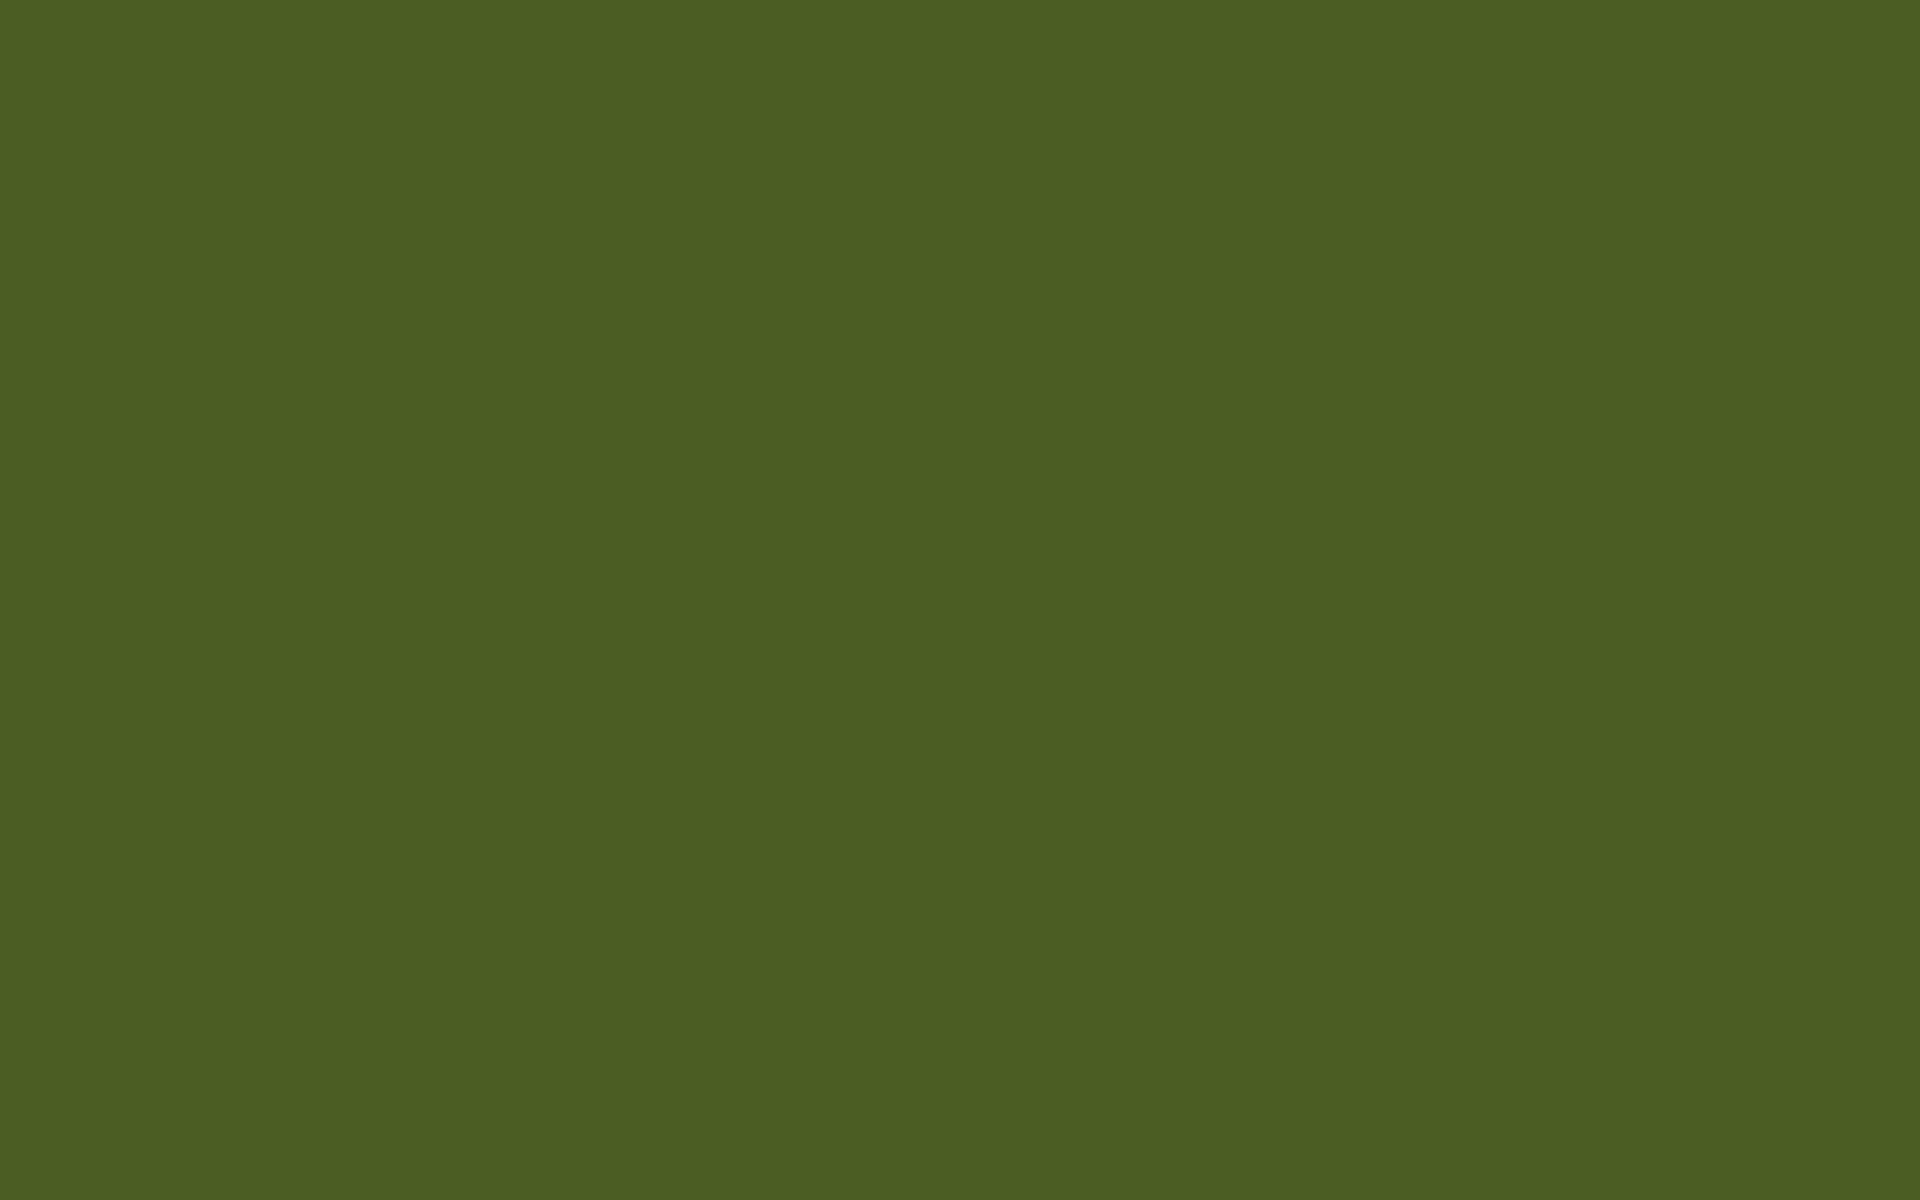 resolution dark moss green - photo #13